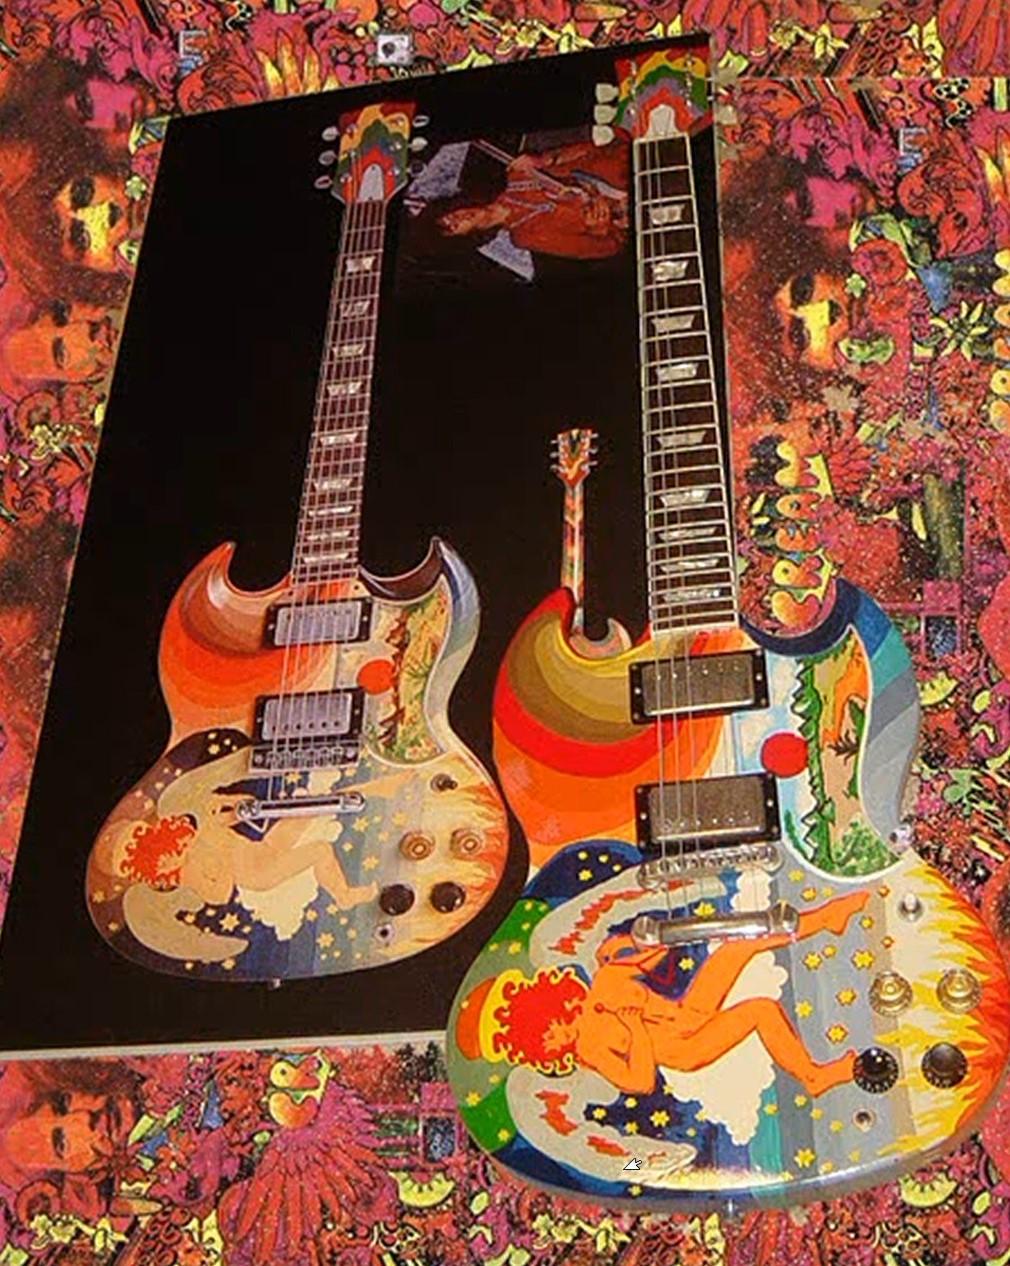 The Fool Guitar: THE GIBSON SG FOOL WEBSITE